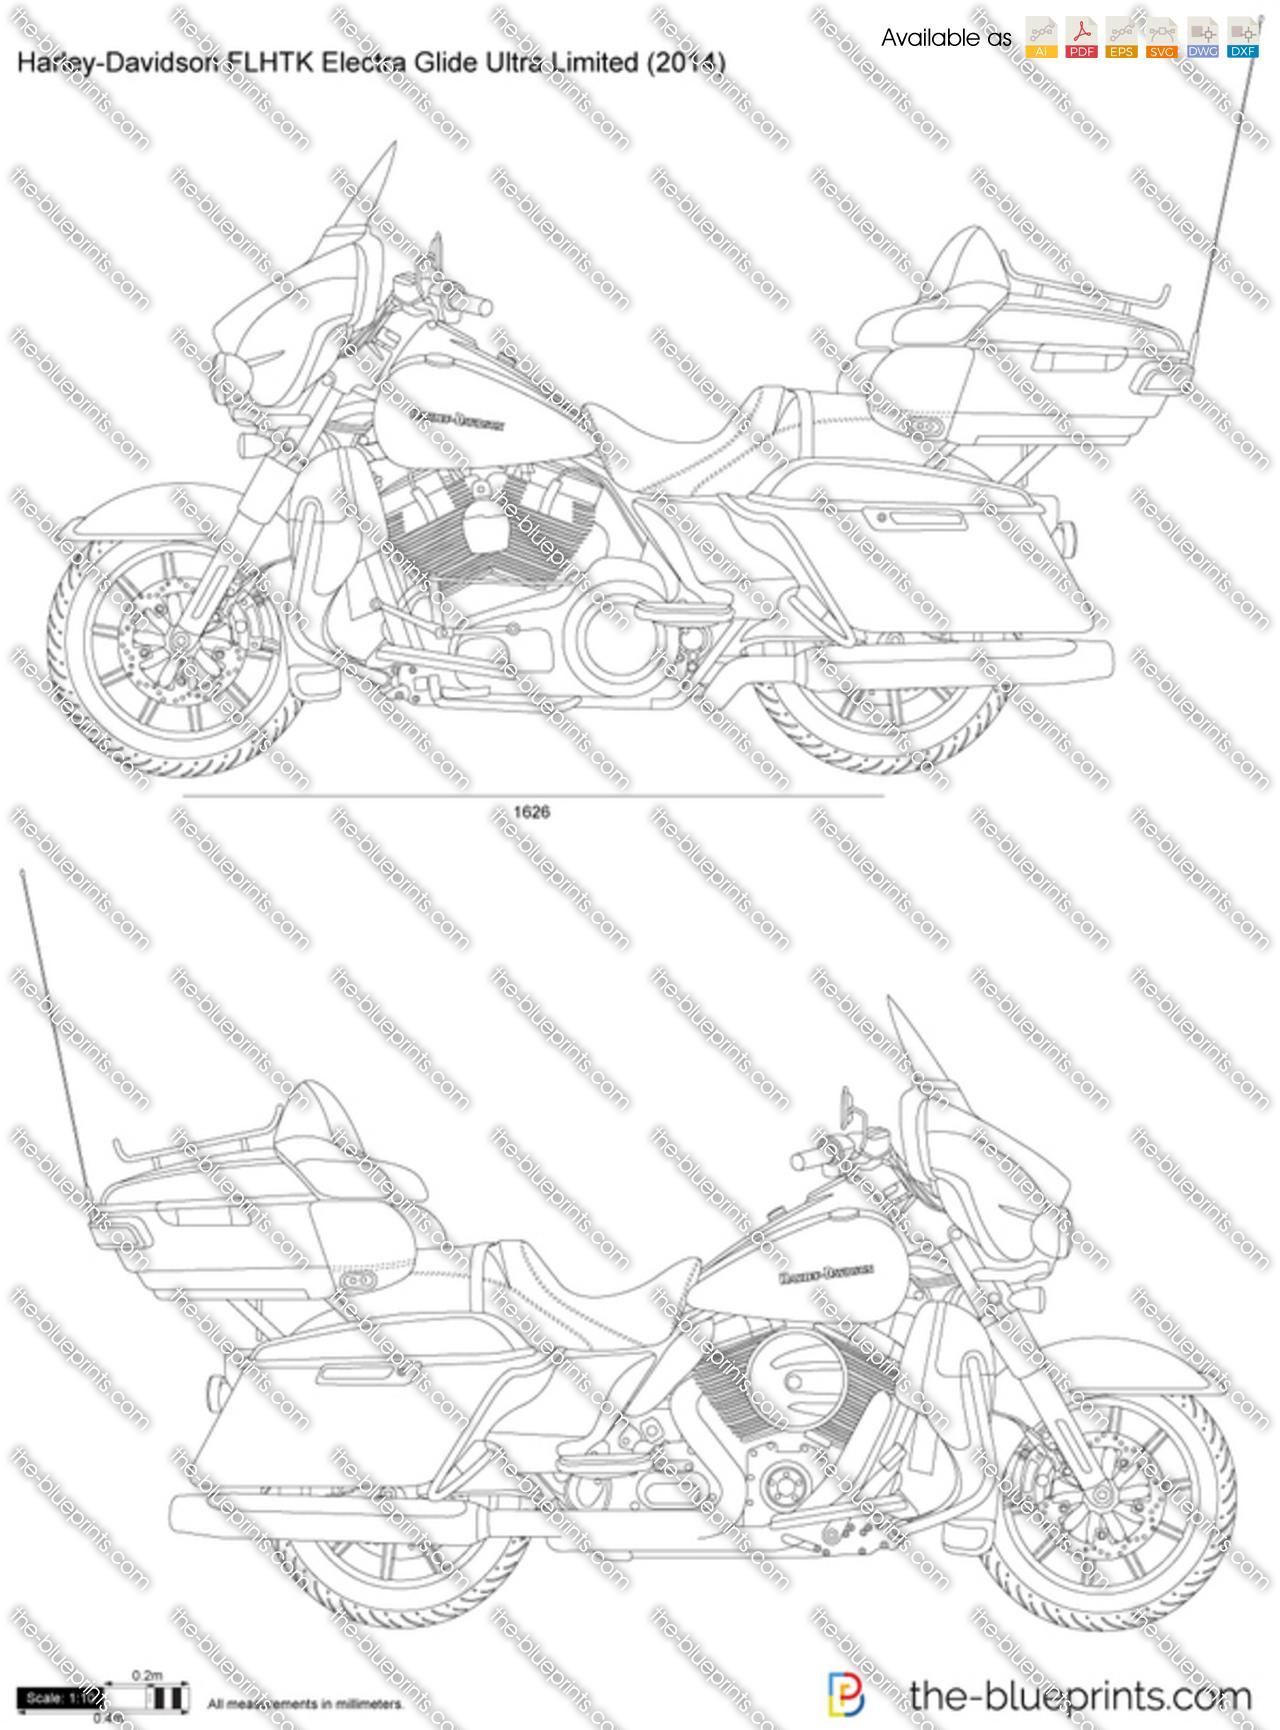 Drawing Of Harley Davidson Electra Glide Harley-Davidson